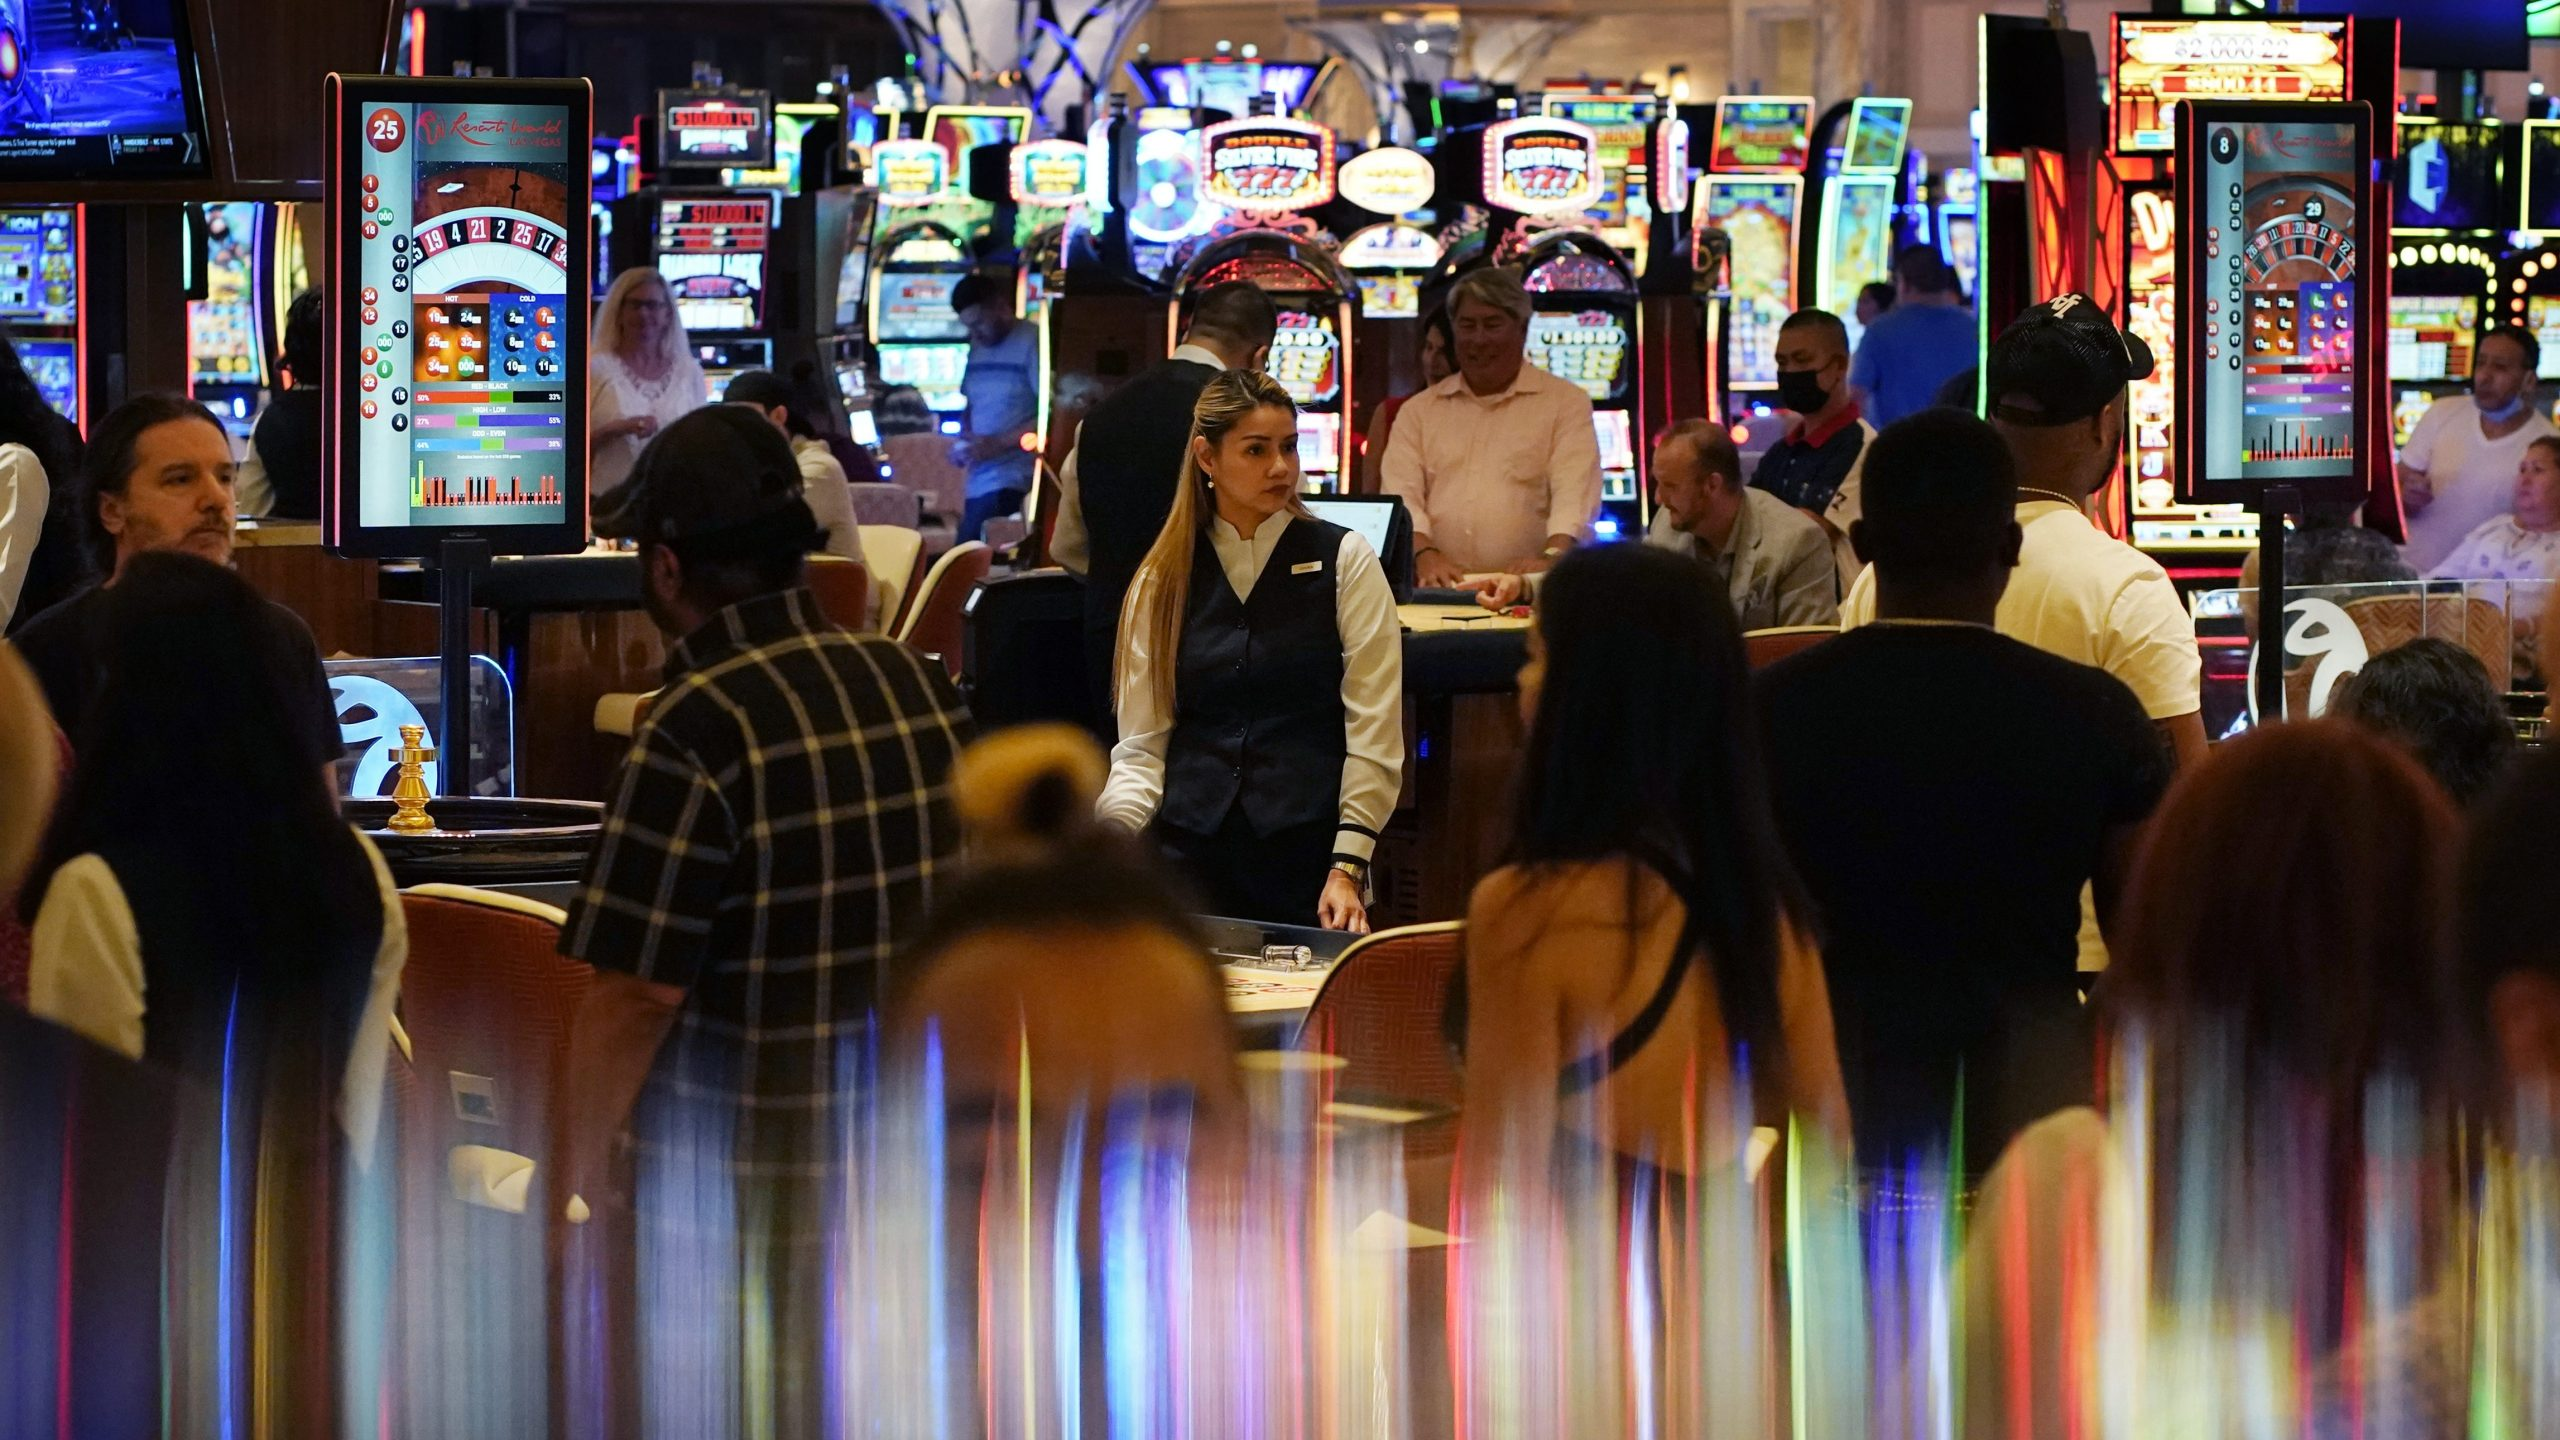 In this June 24, 2021, photo, crowds walk through the casino during the opening night of Resorts World Las Vegas in Las Vegas. (John Locher / Associated Press)